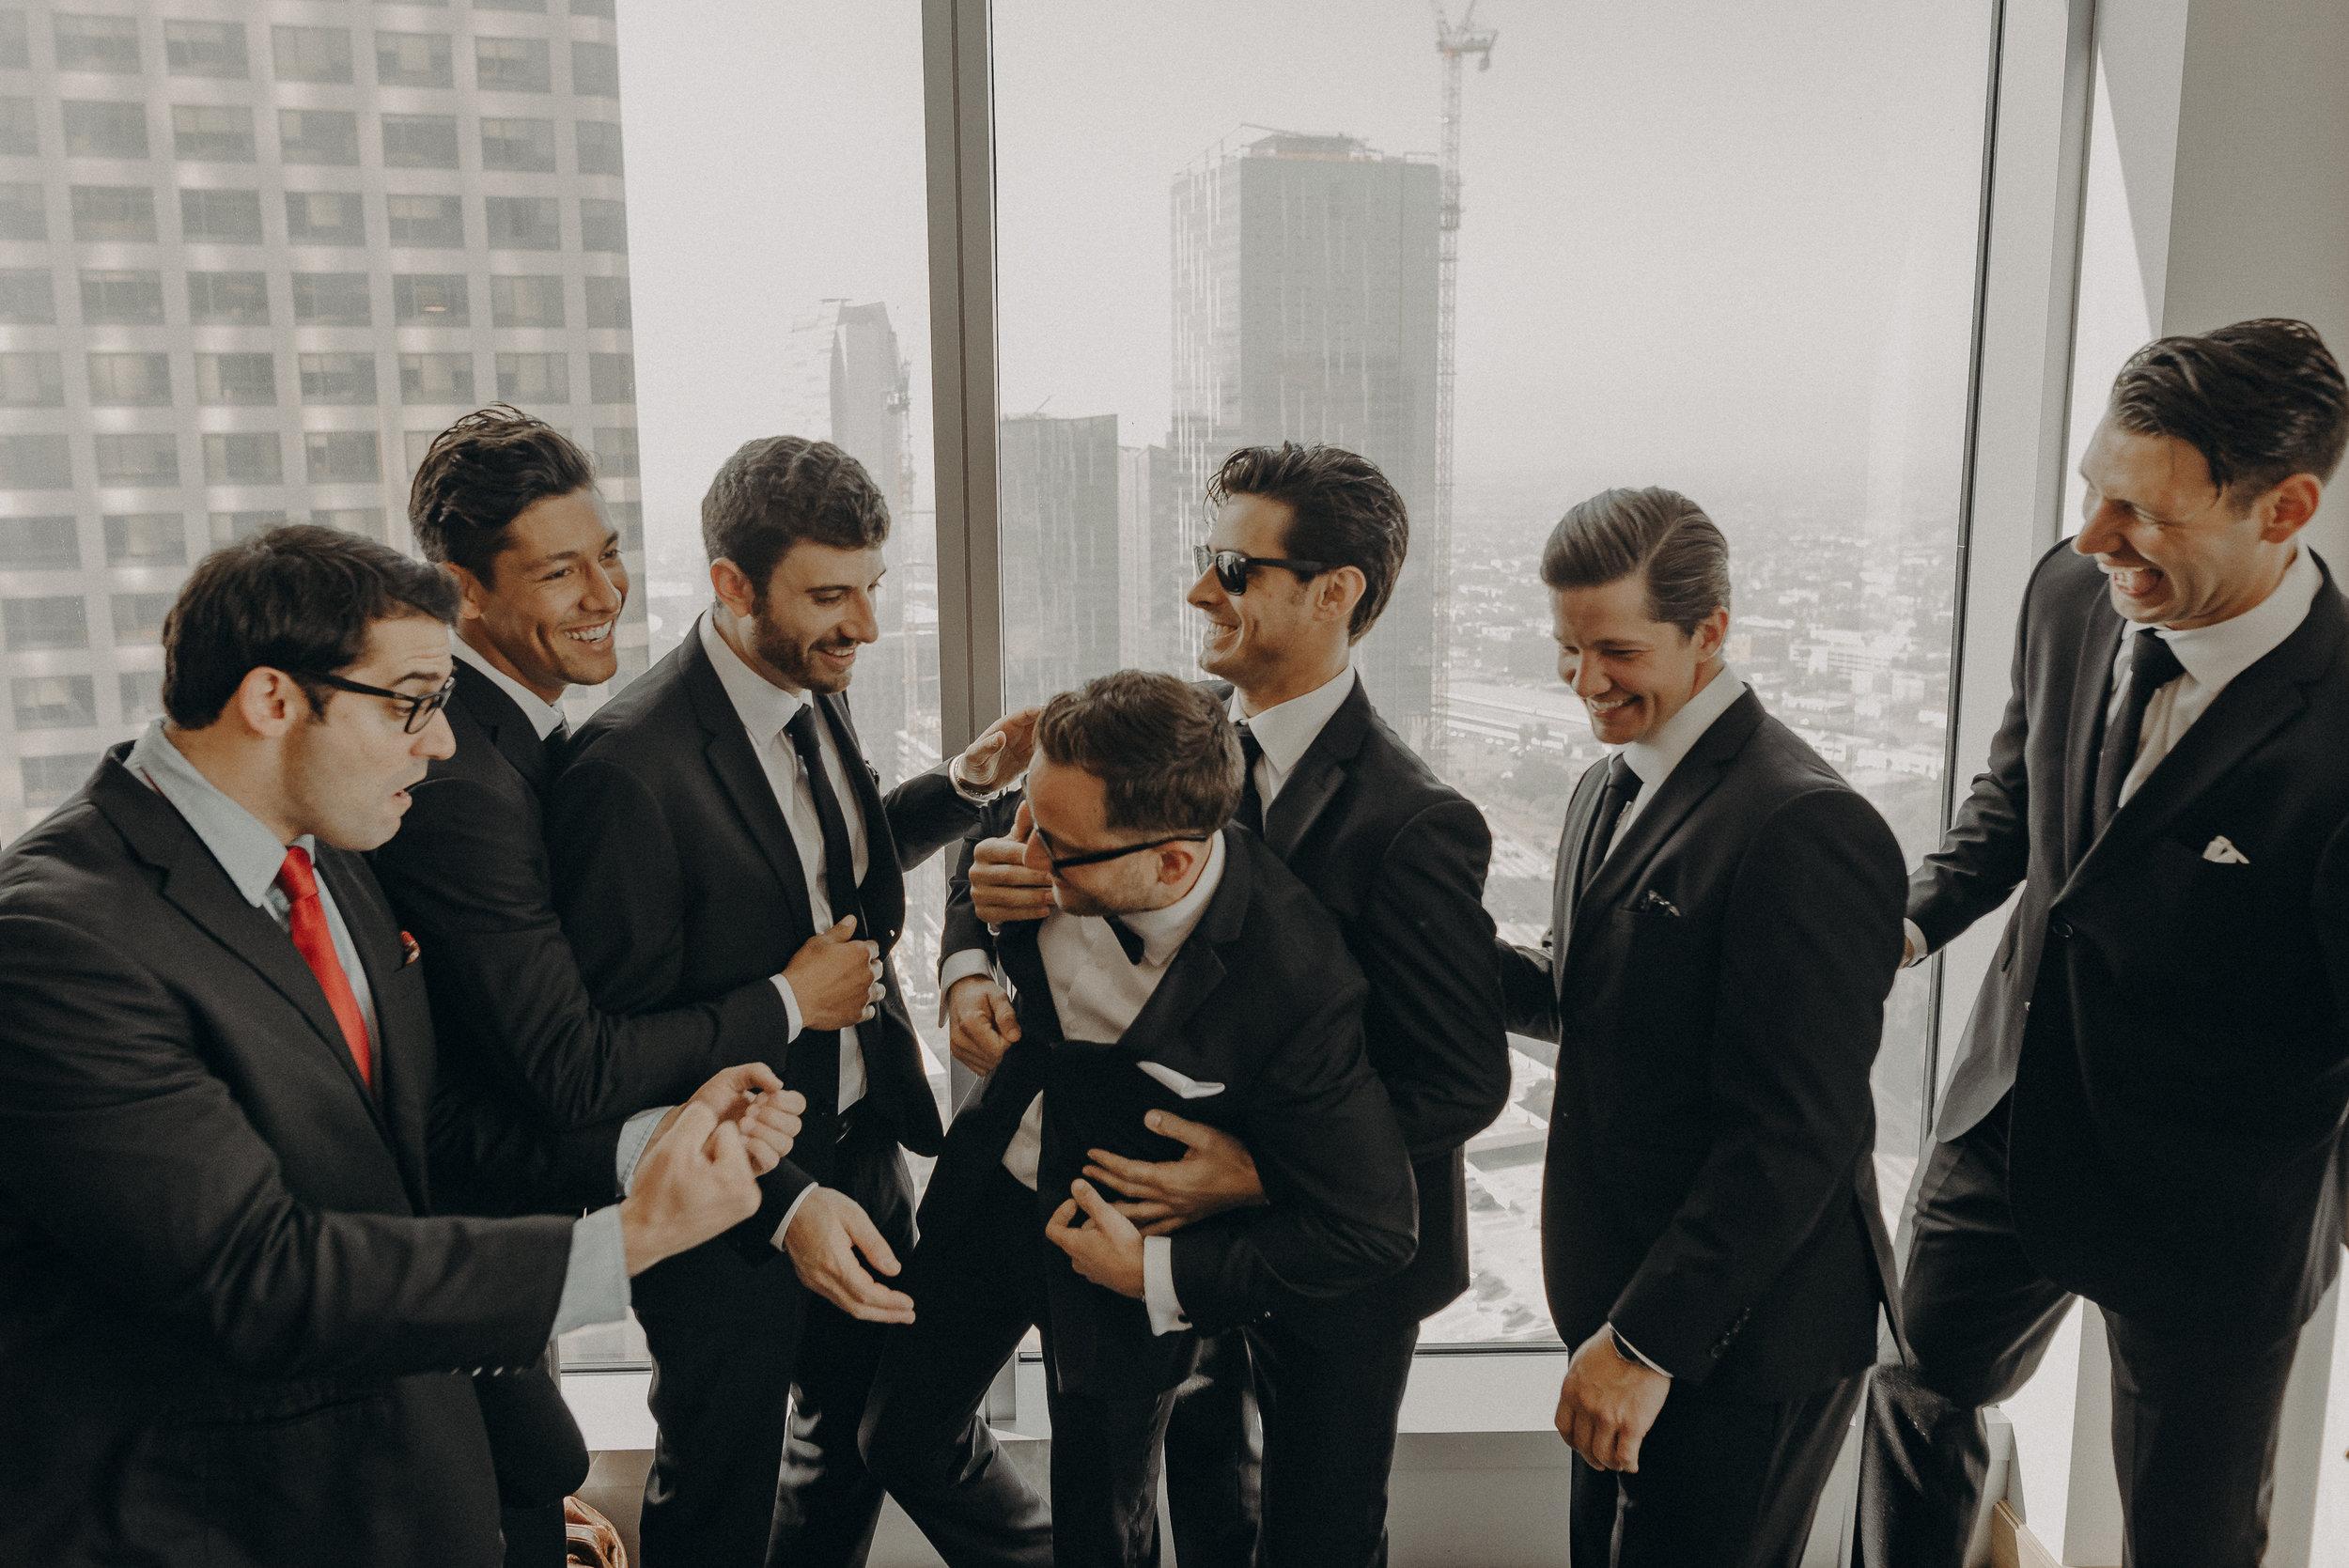 ©Isaiah + Taylor Photography - the Millwick Wedding, Long Beach Wedding Photographer-032.jpg